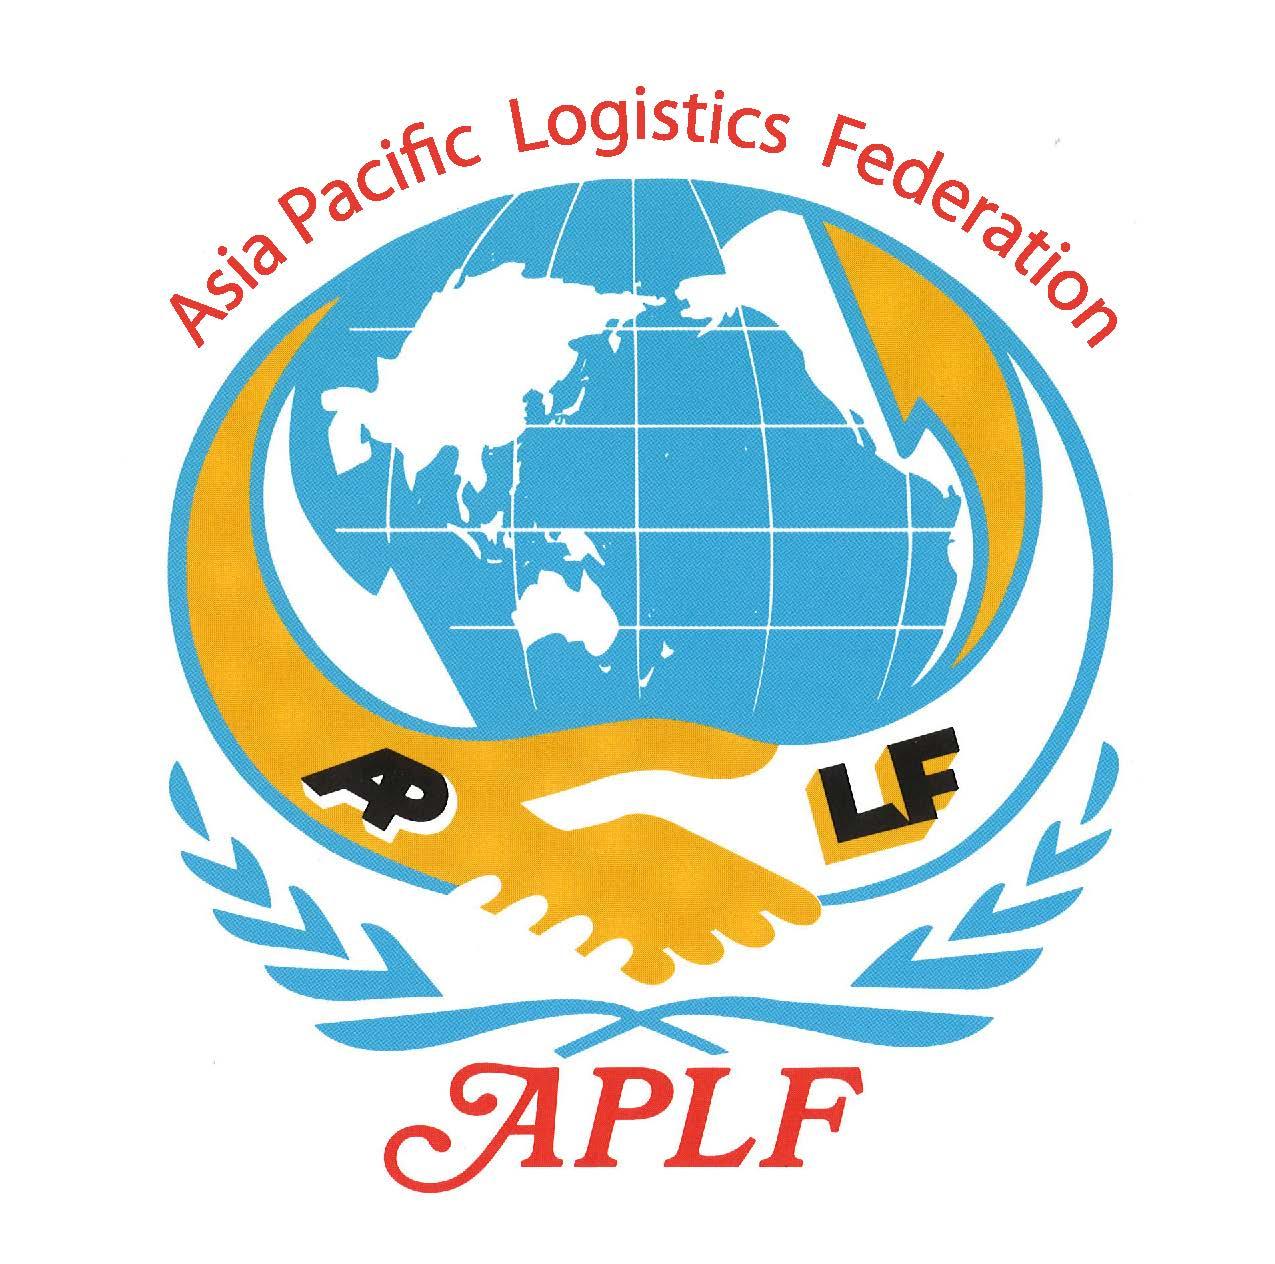 Asia Pacific Logistics Federation